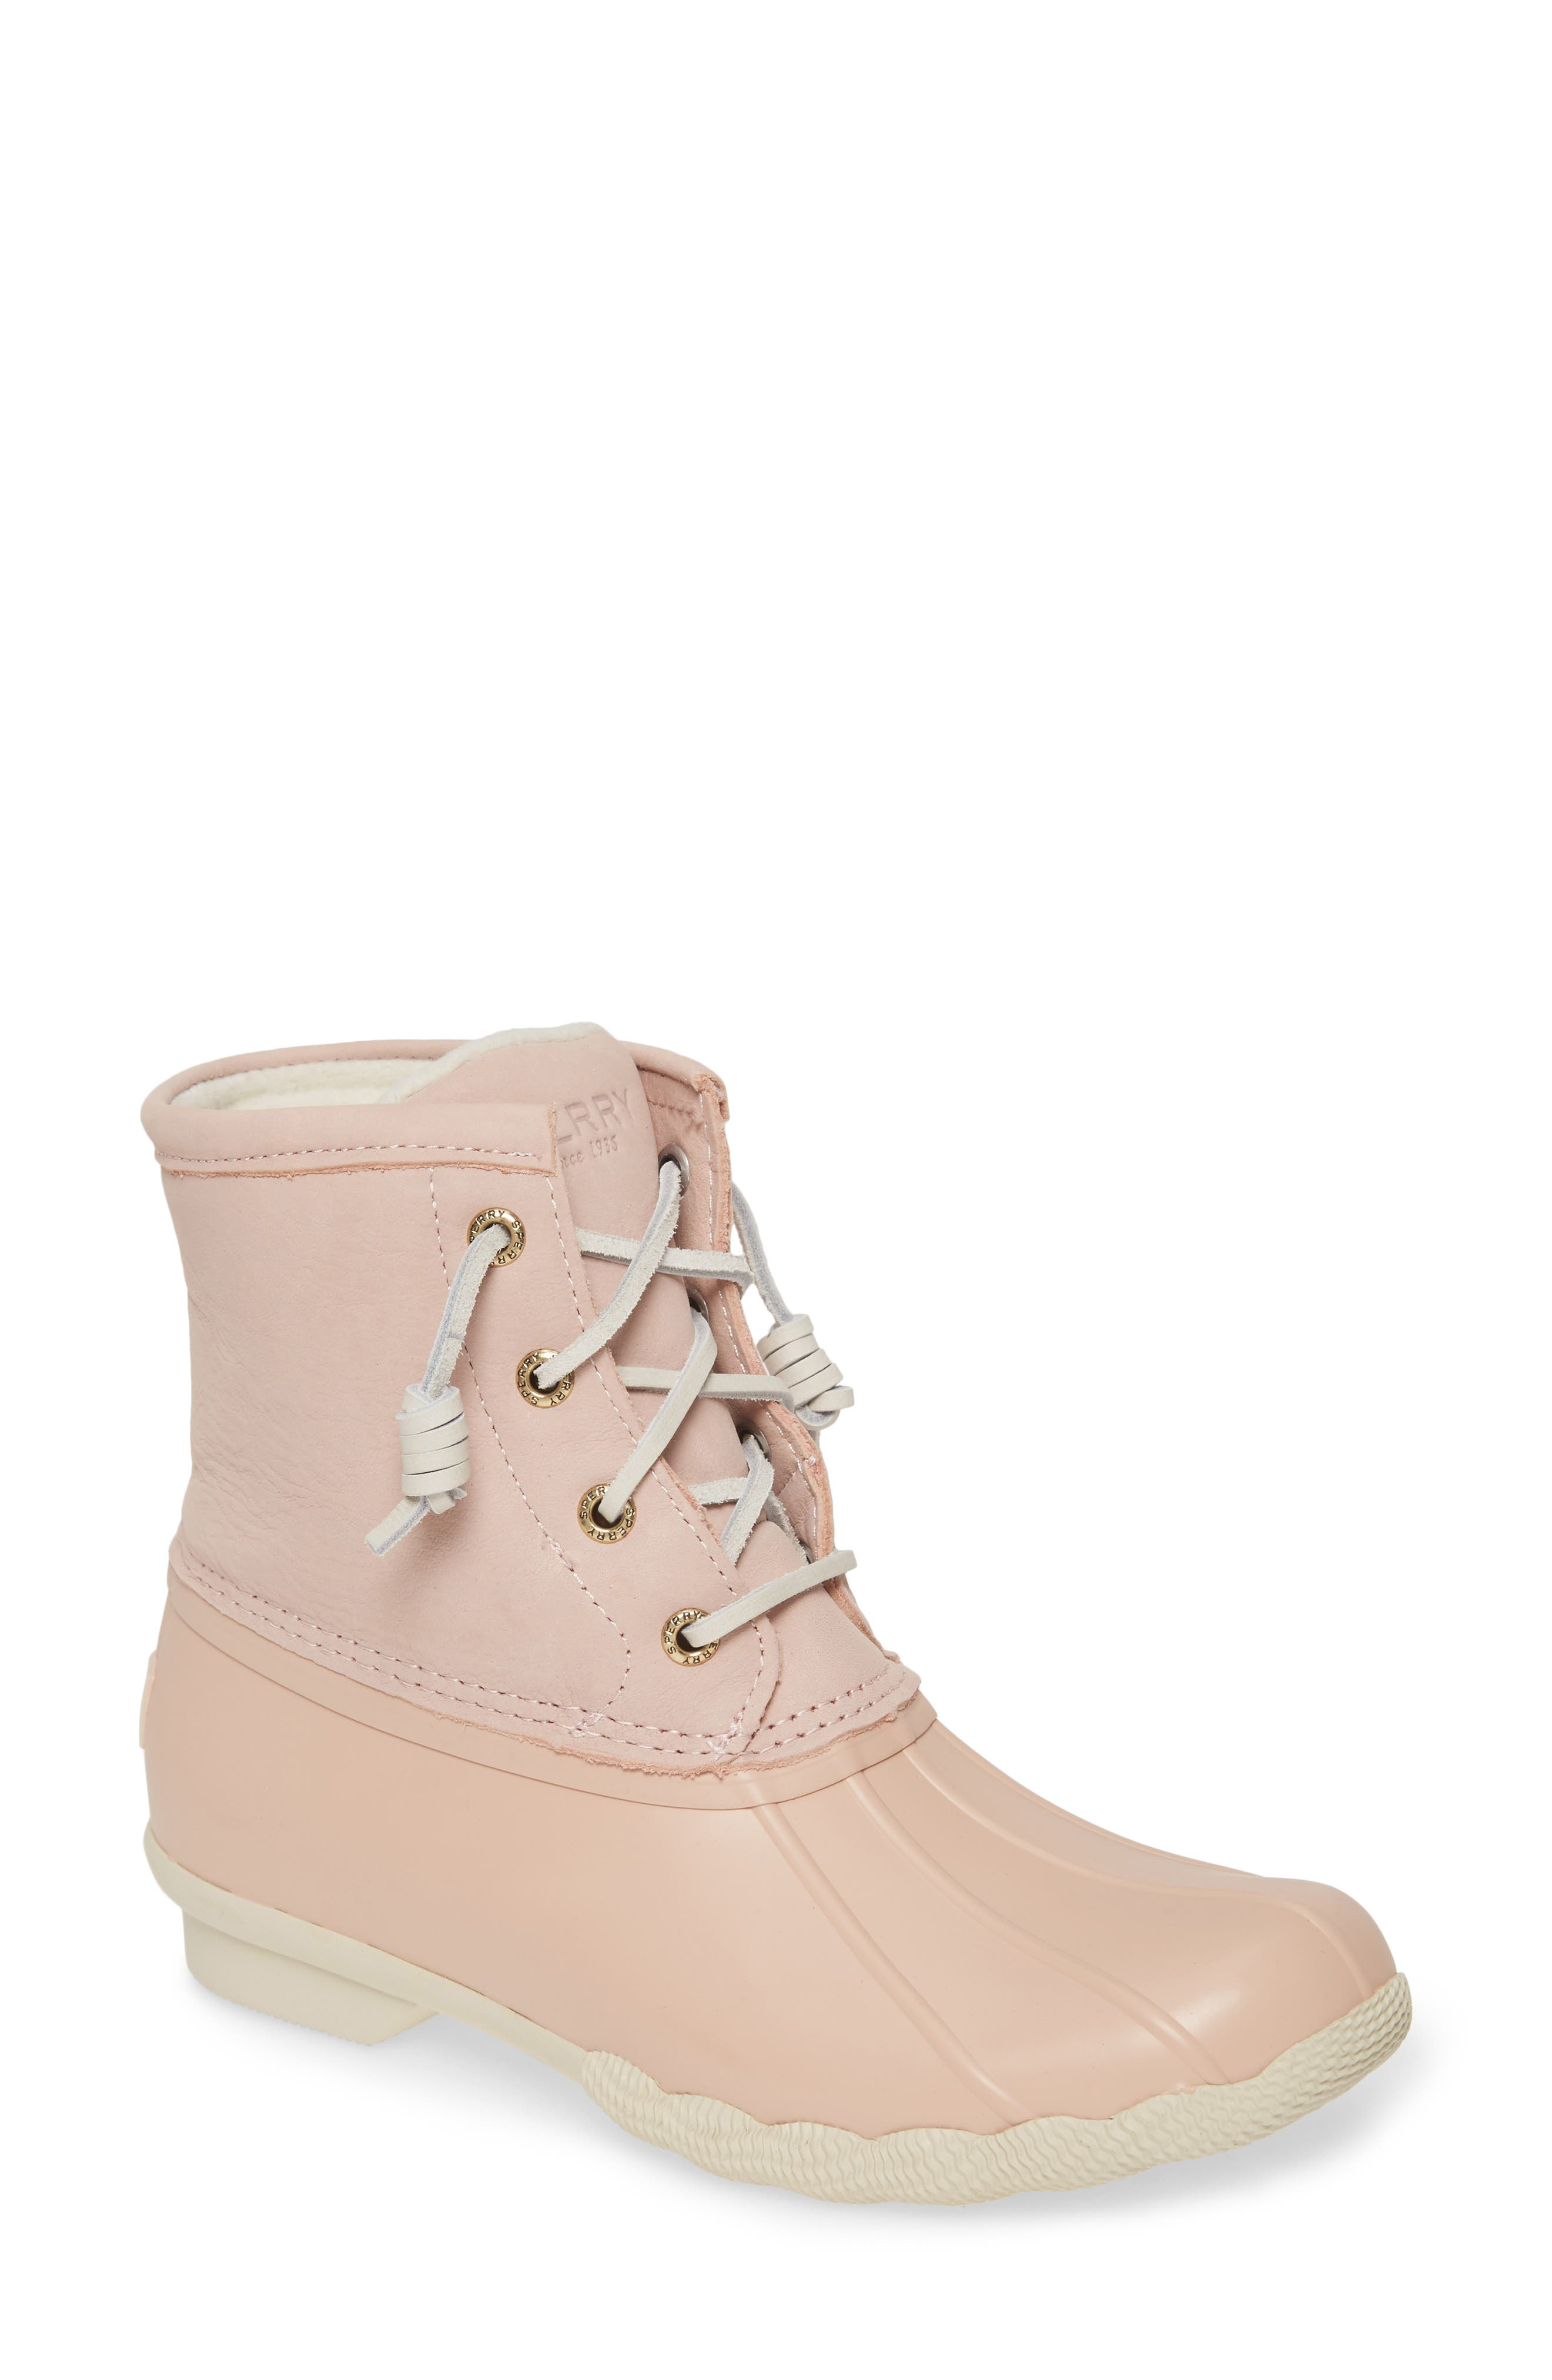 Sperry | Saltwater Rain Boot